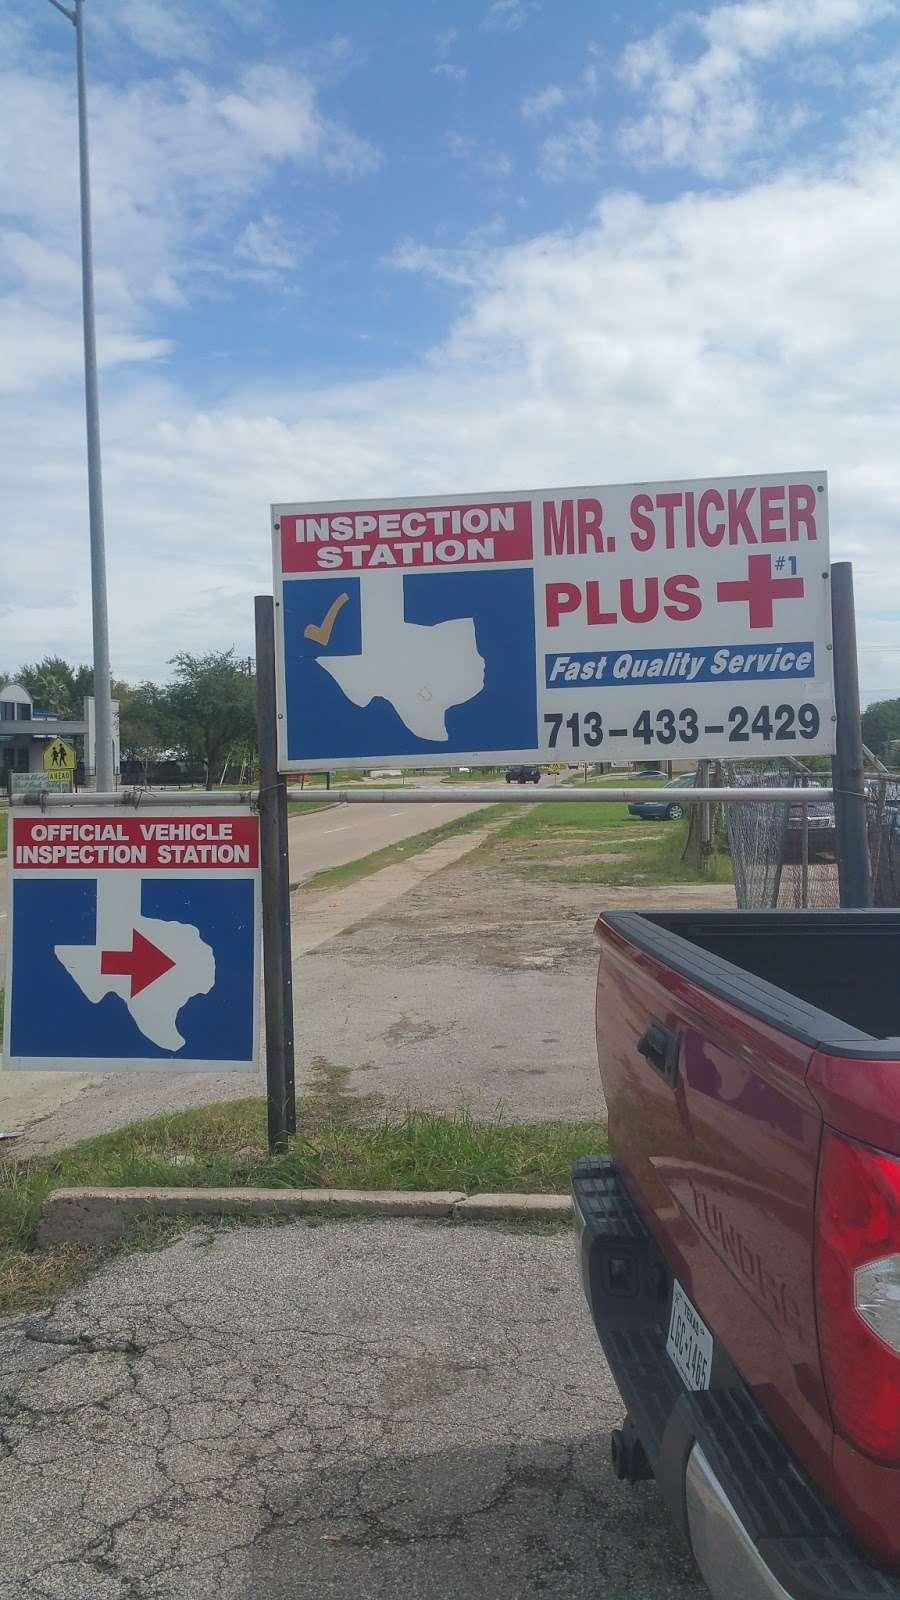 Mr.Sticker Plus Plus LLC - store  | Photo 2 of 4 | Address: 5123 W Orem Dr, Houston, TX 77045, USA | Phone: (713) 433-2429